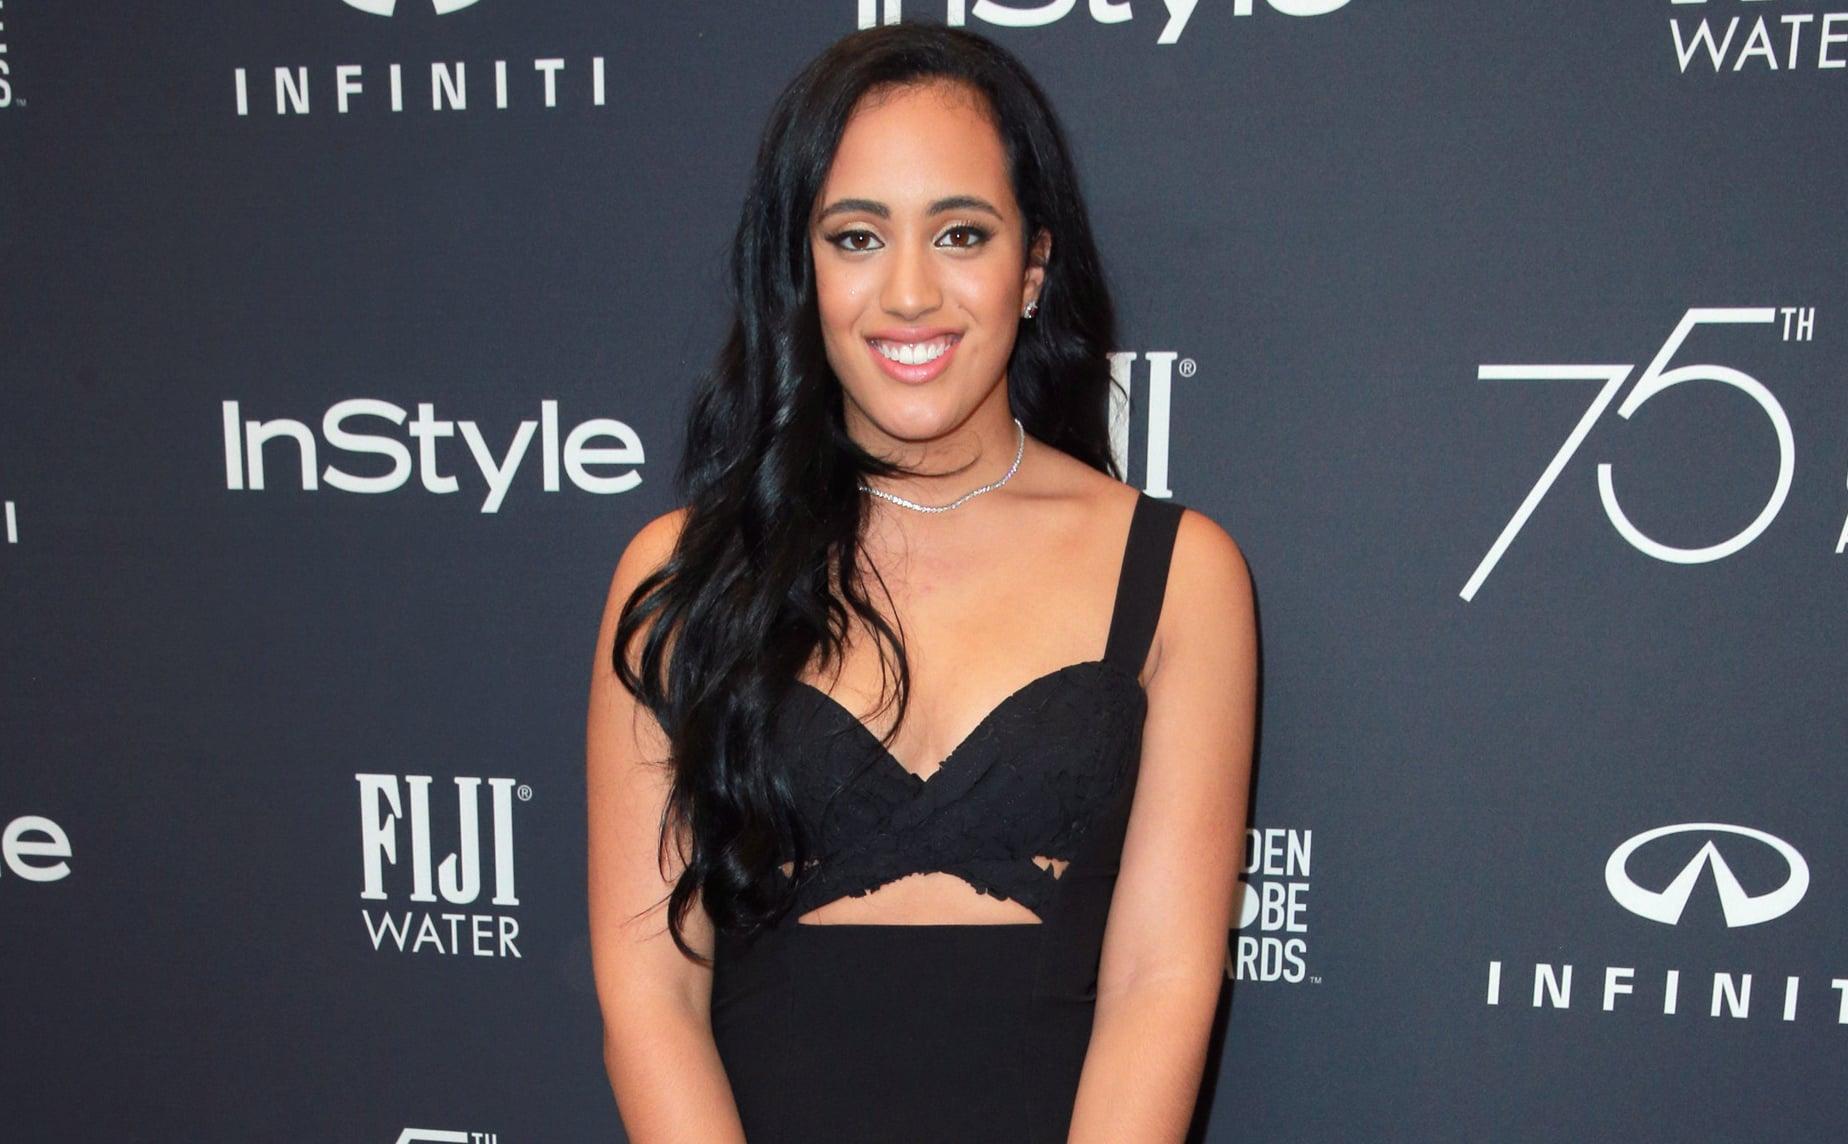 Dwayne Johnson's daughter Simone Garcia Johnson selected as Golden Globe Ambassador